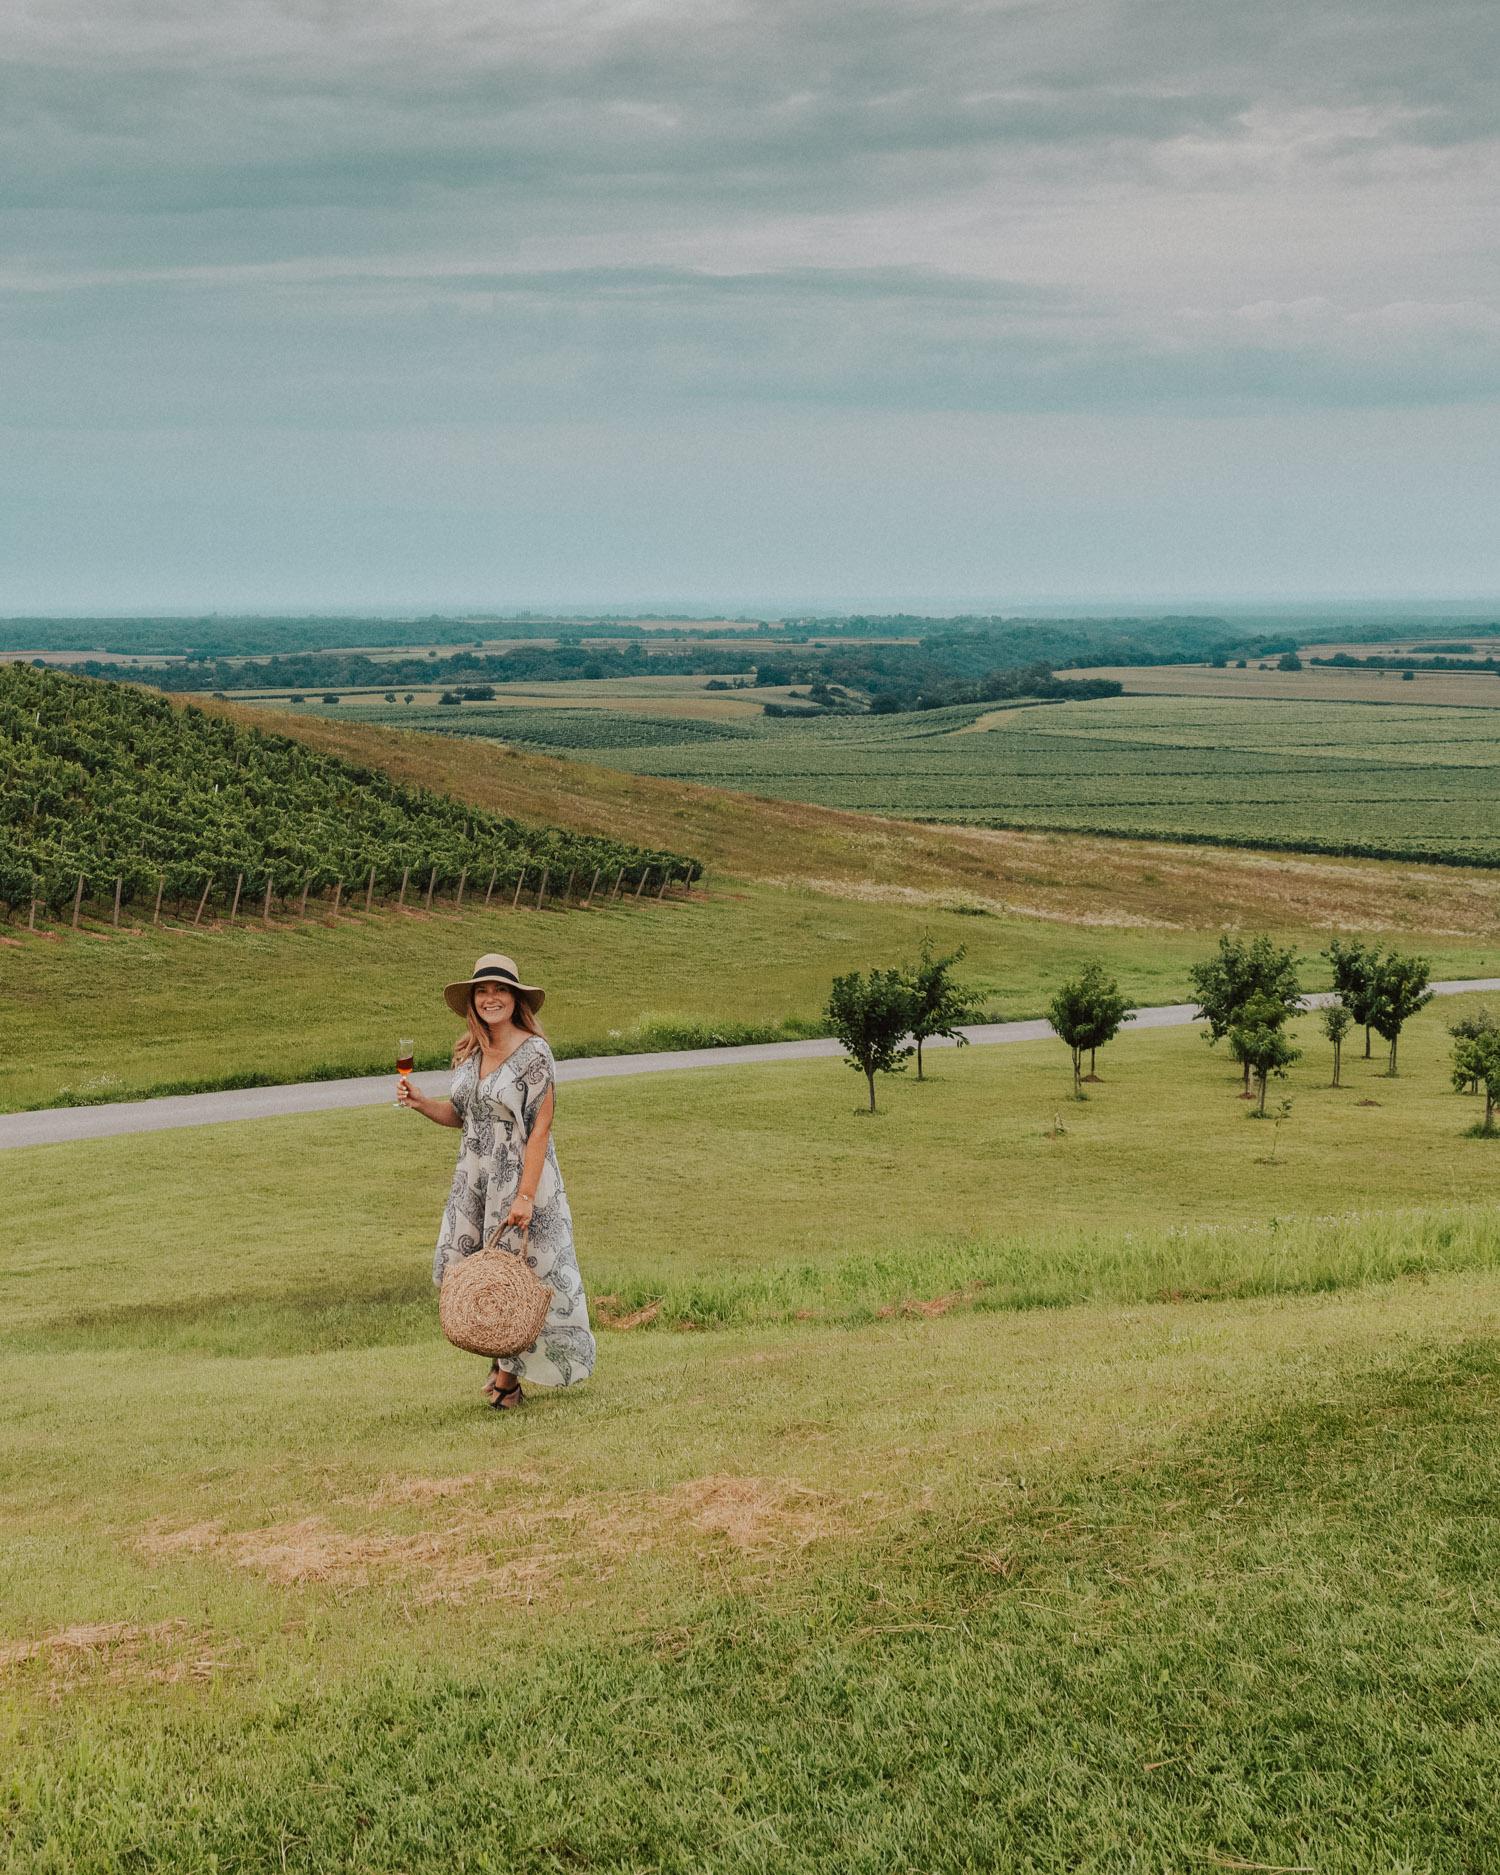 Principovac Country Estate |Things to do in Slavonia, Croatia